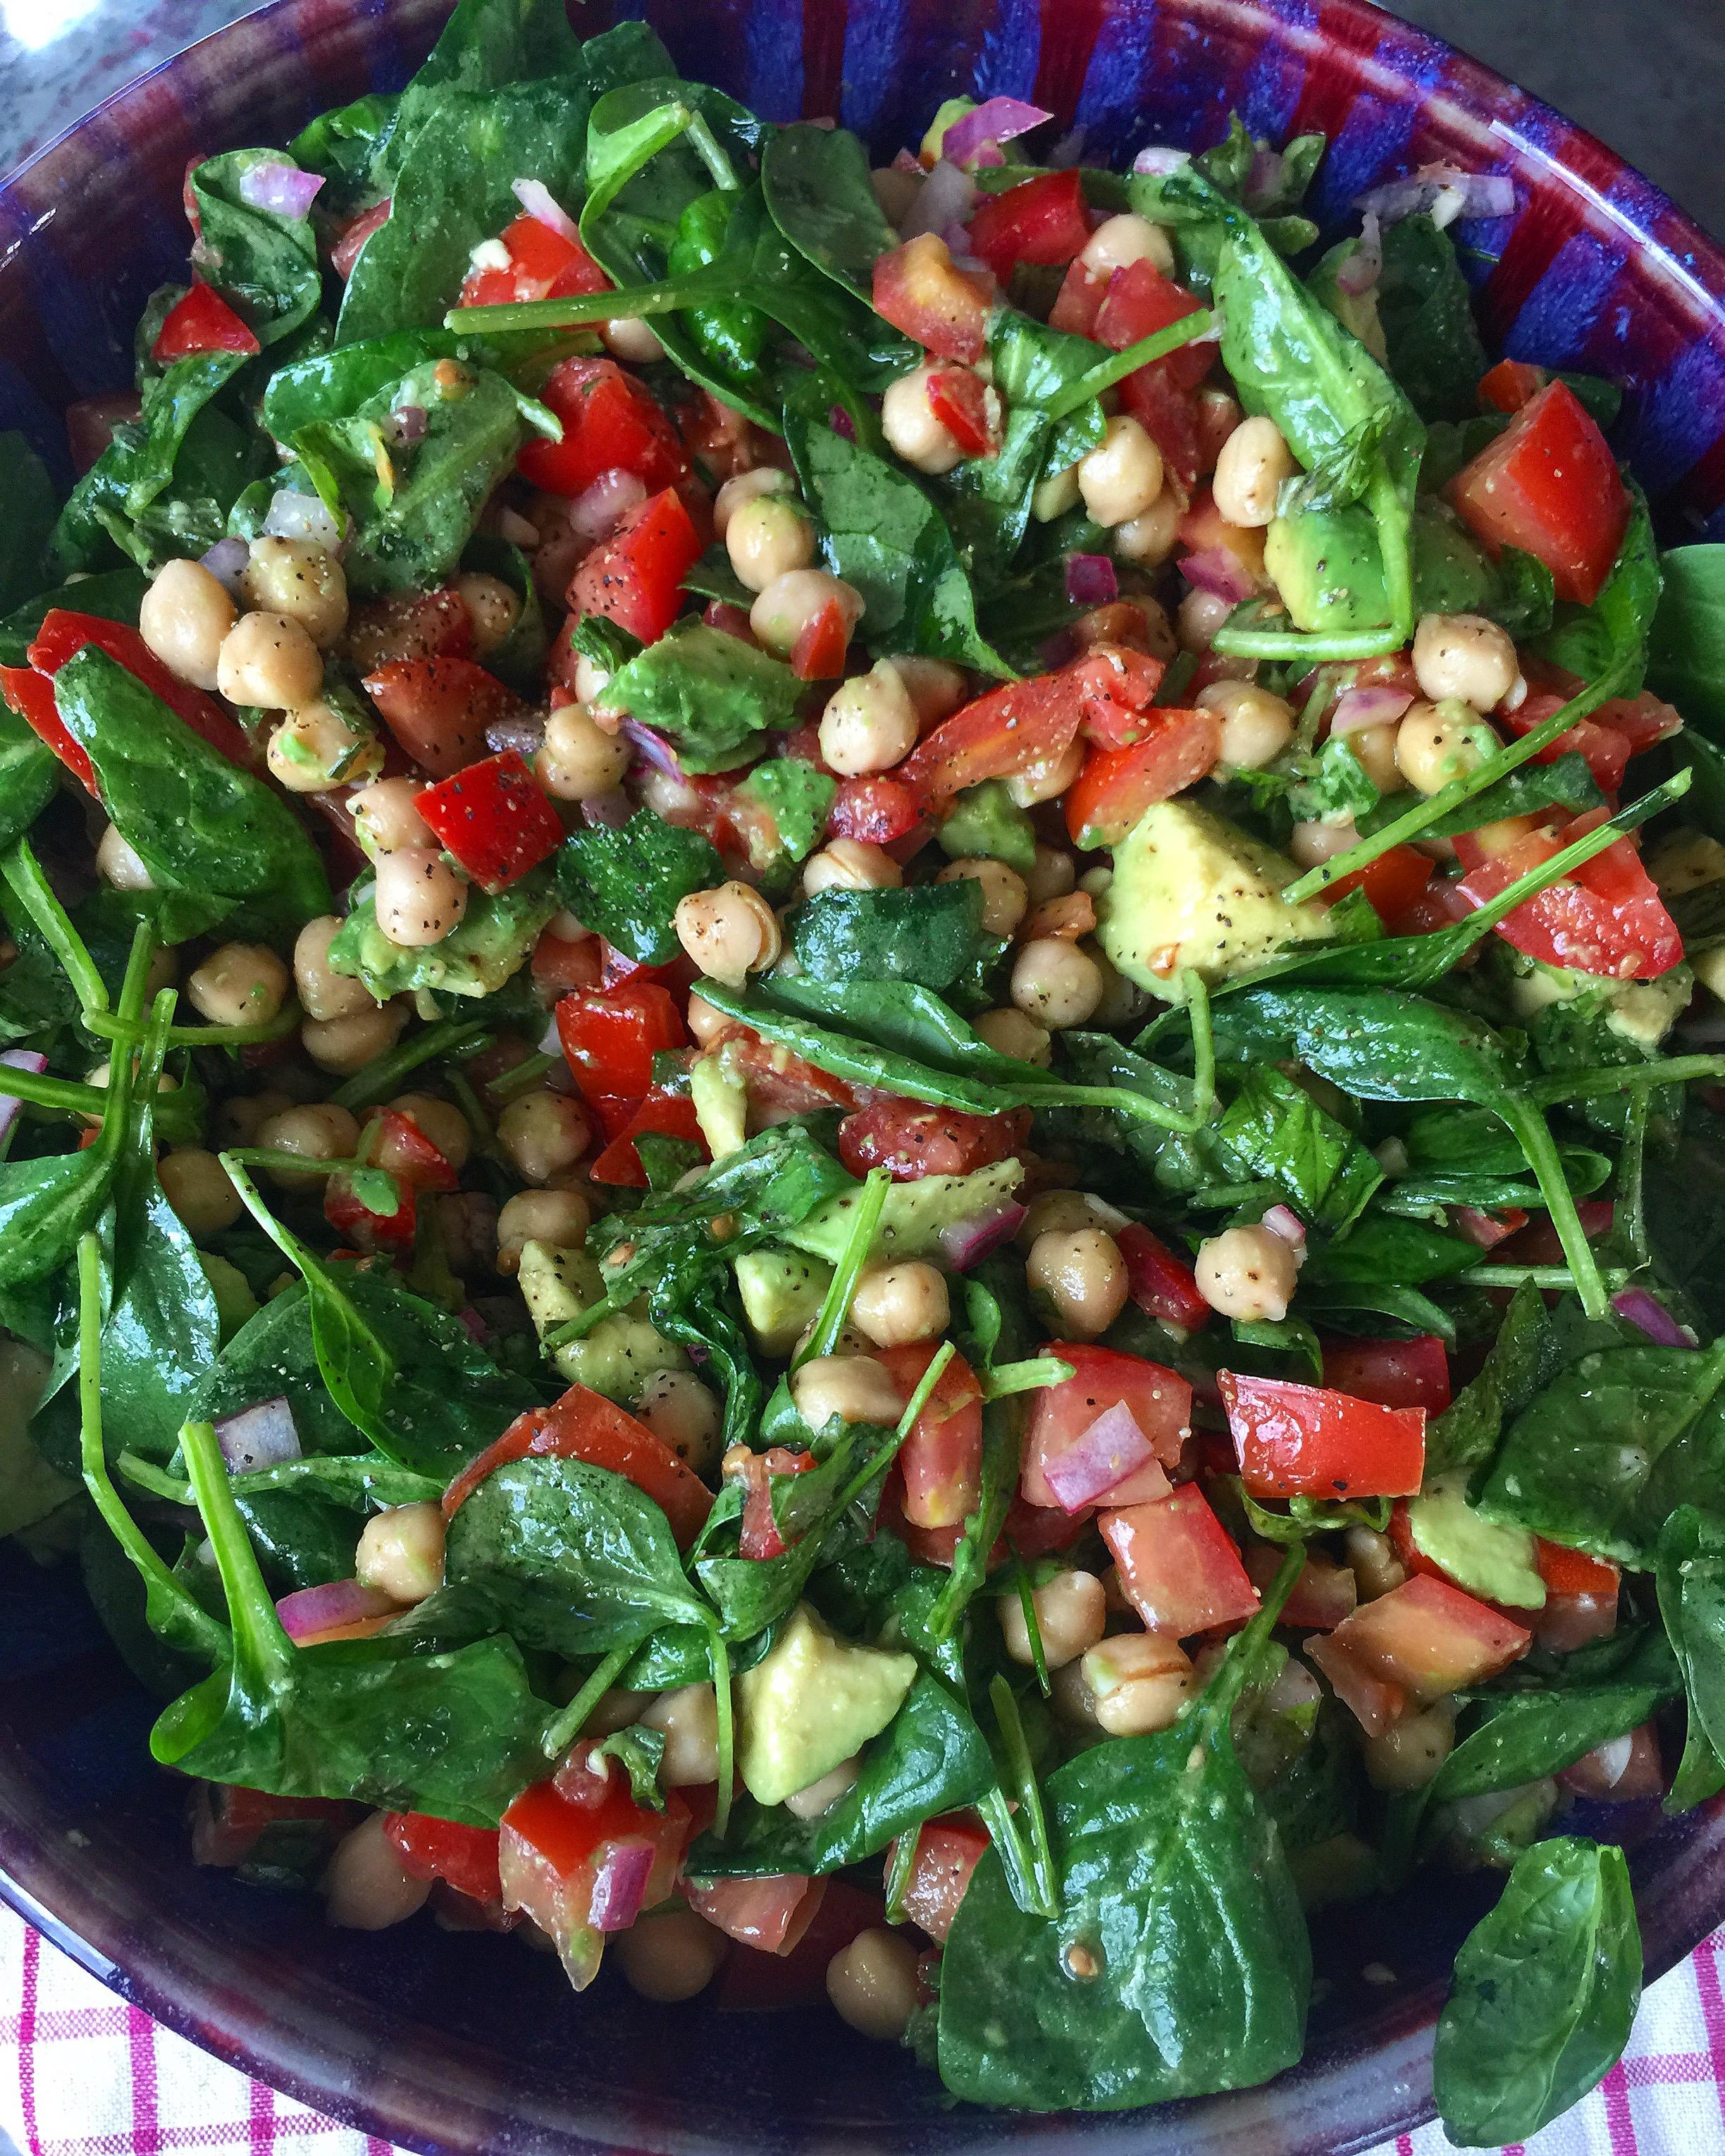 Tomato Avocado Spinach Salad w/ Lemon Basil Vinaigrette